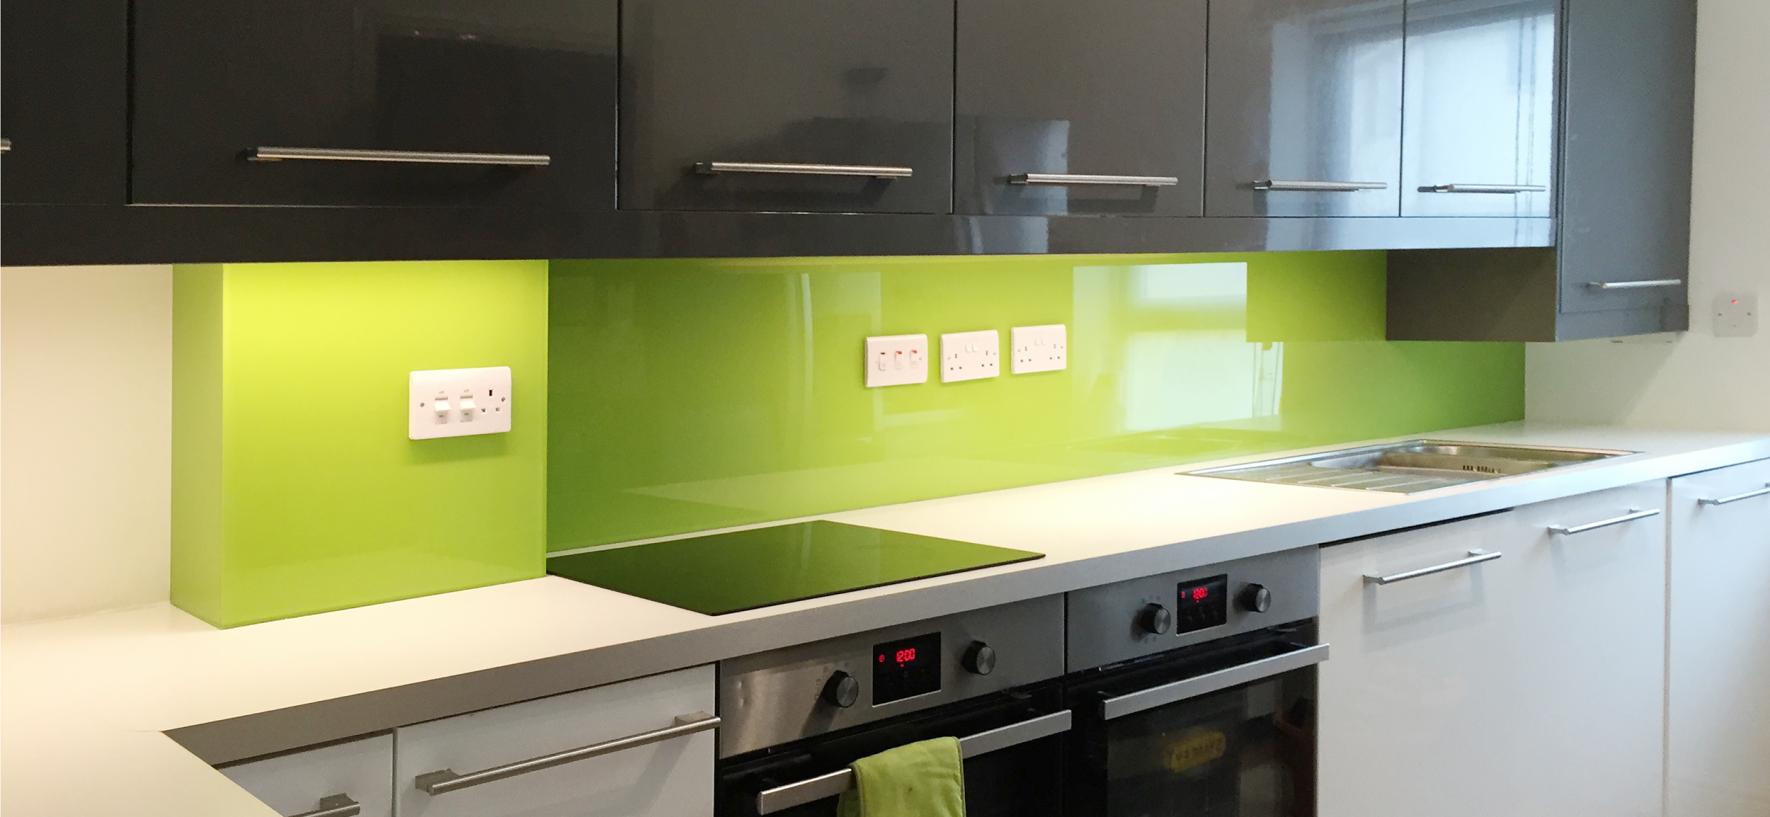 Kitchen colour ideas: the best citrus shades for splashbacks